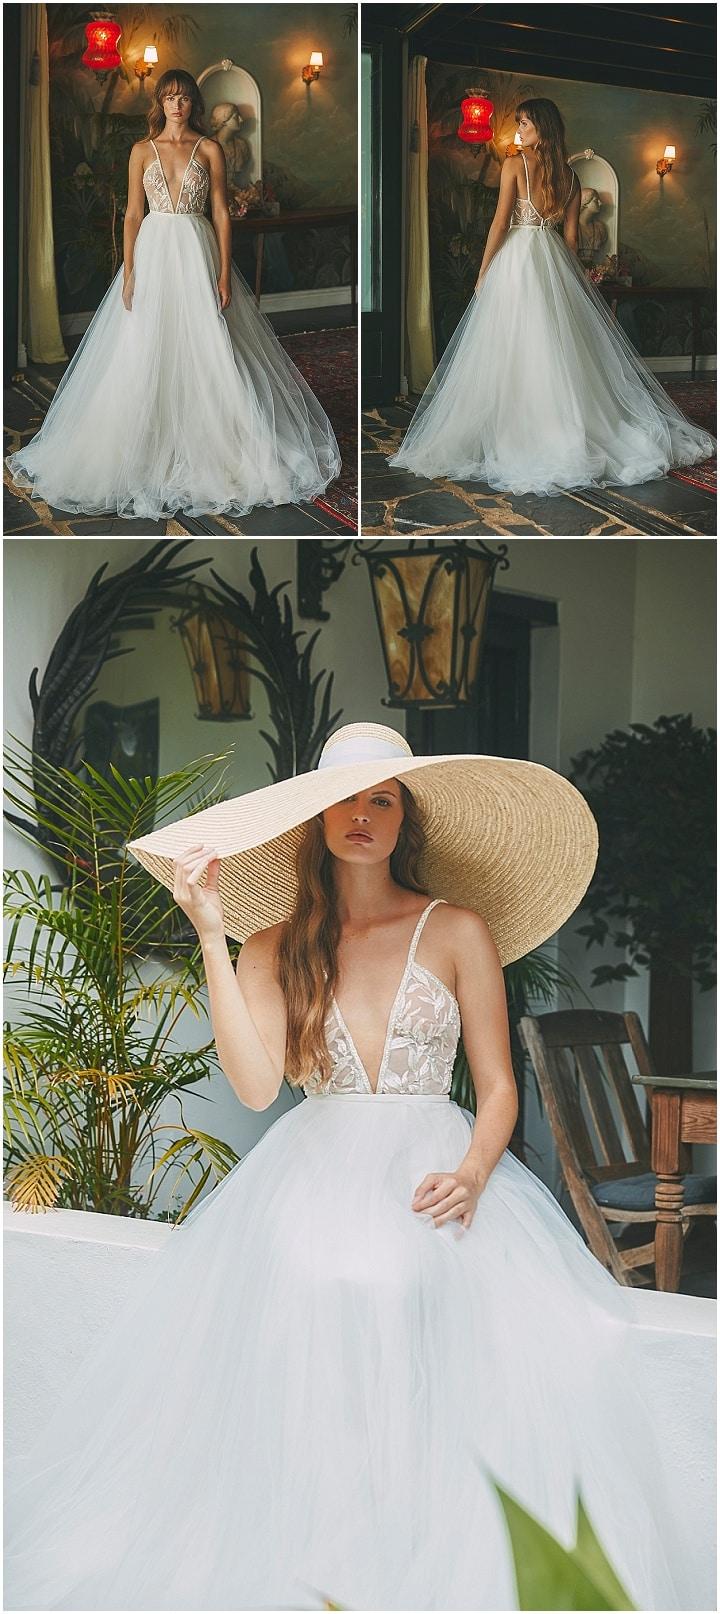 Bridal Style: Anna Georgina's Enchanting Romance Collection - Sensual, Powerfully and Undeniably Feminine.